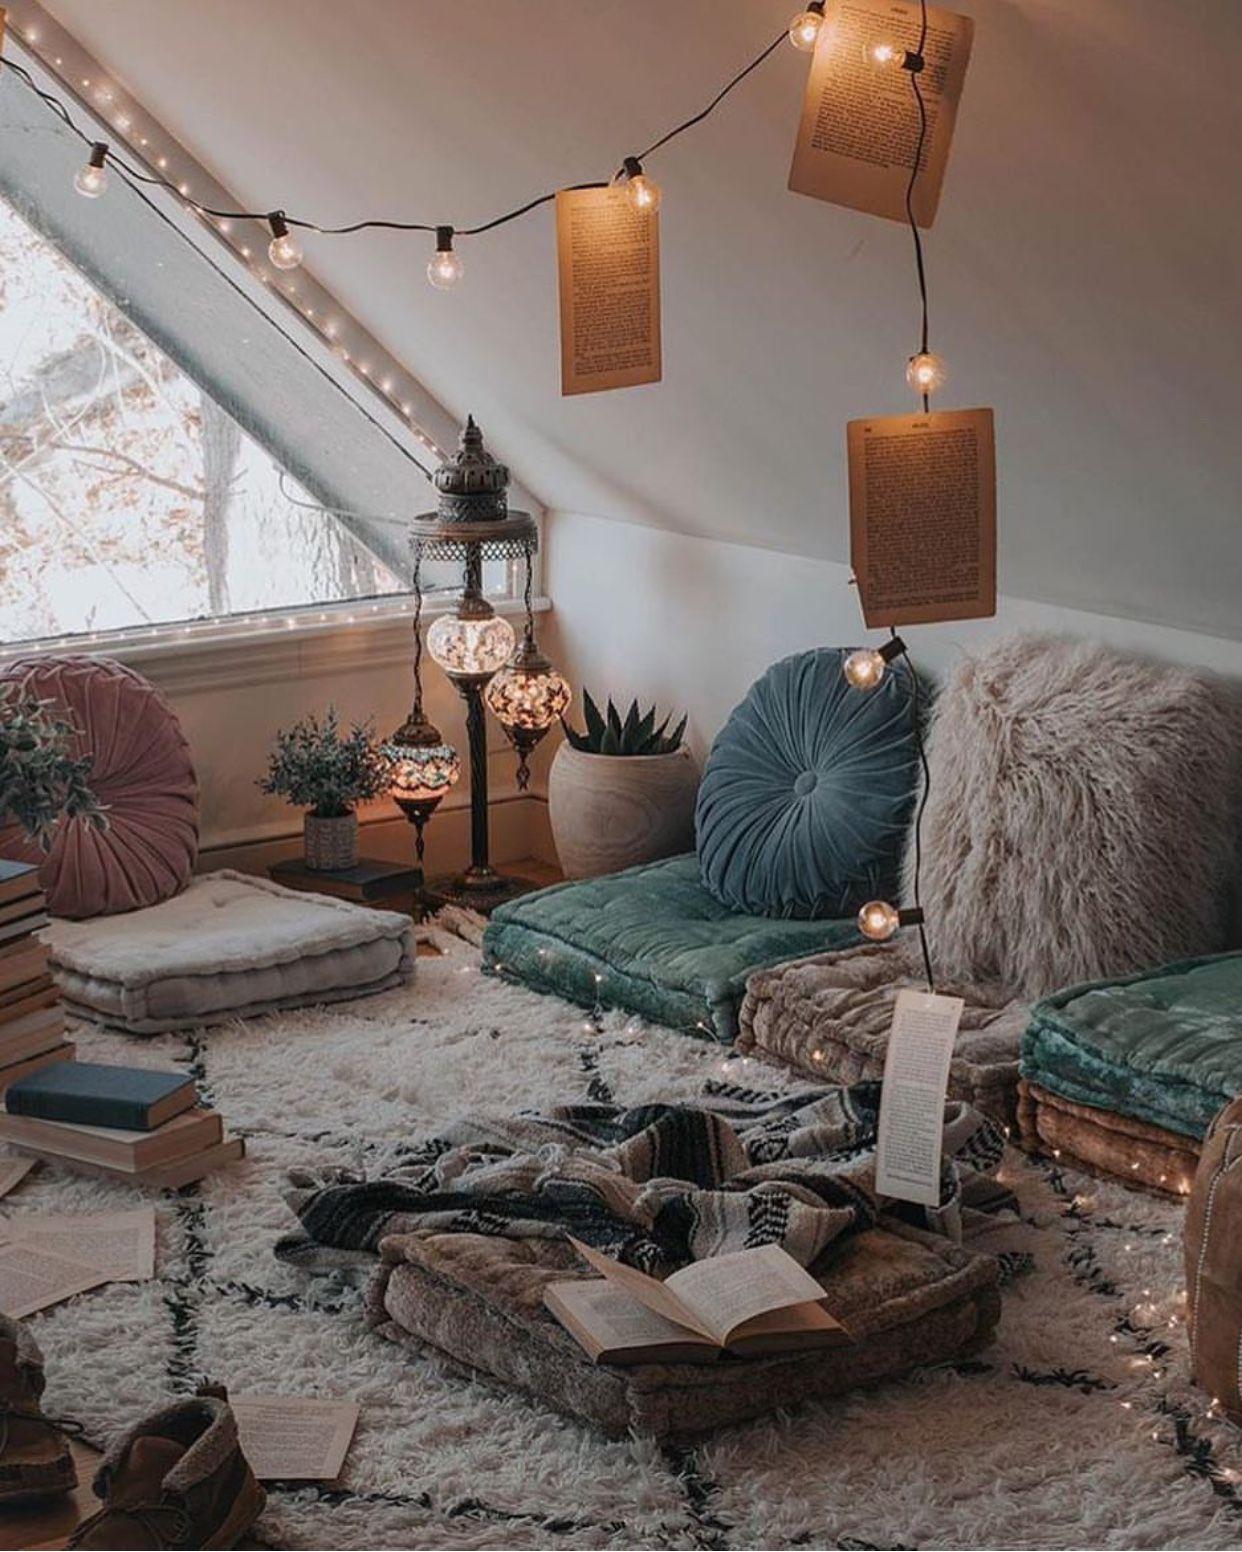 20 Ultra cozy Design Ideas For Fall Warmth